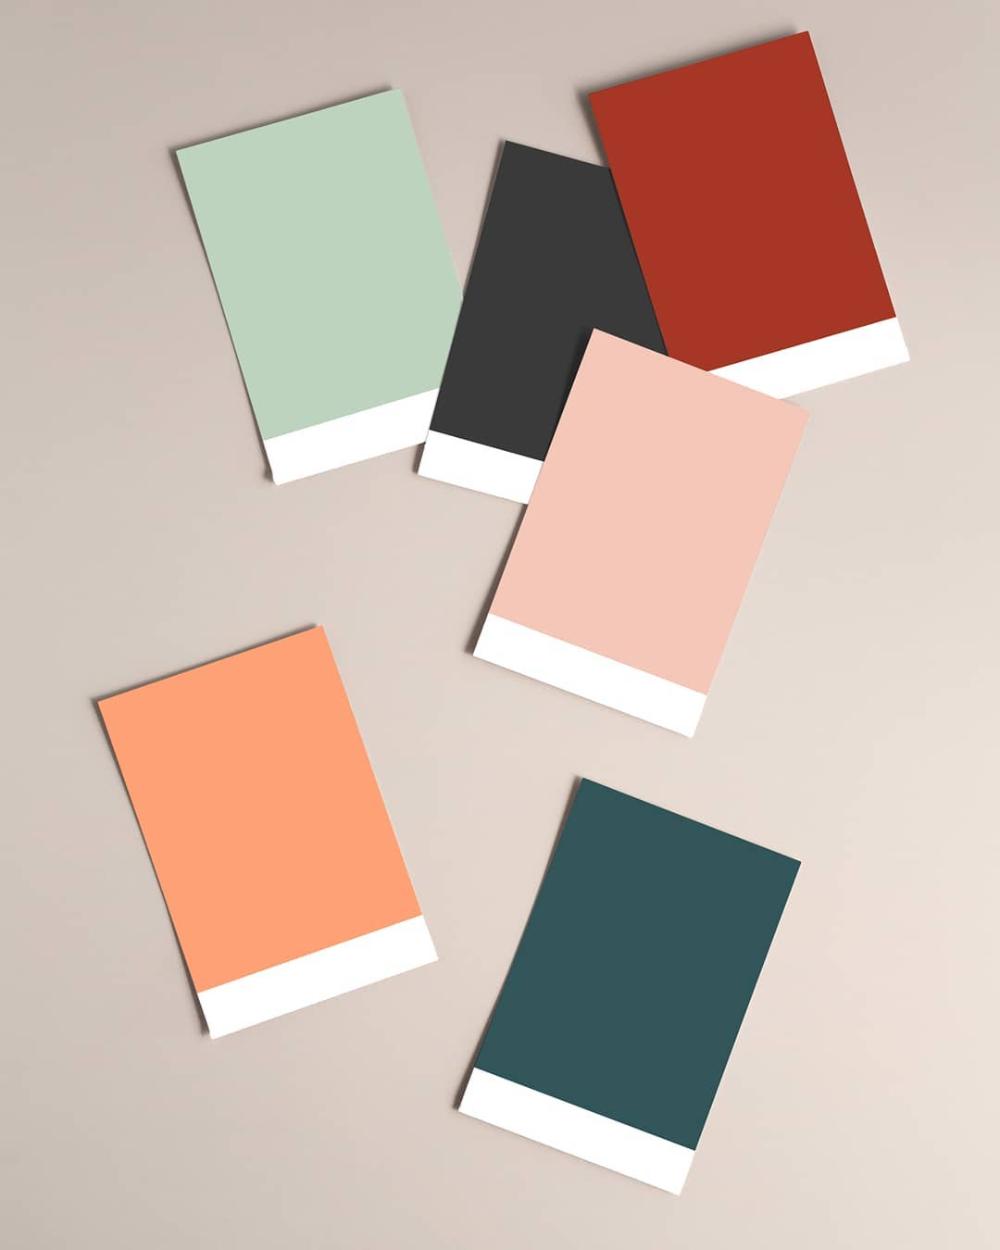 Elena Brand Web Design En Instagram Color Palette For Bouclette Co Mockup By Moyo Studio Color Palette Aesthetic Colors Color Inspiration